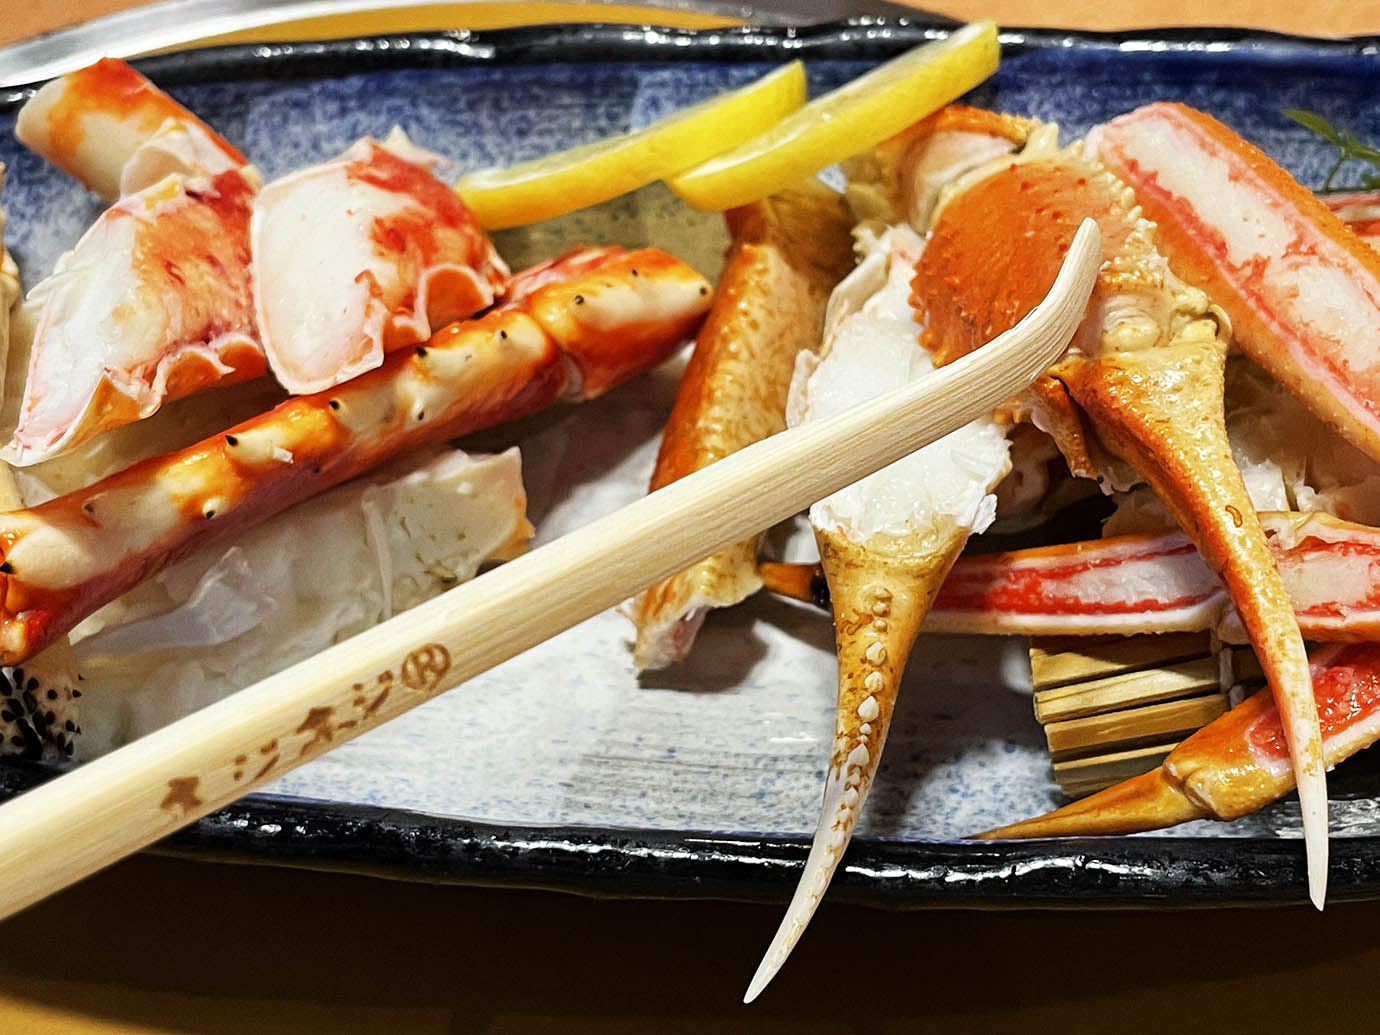 kani-douraku-kani-cream-croquette6